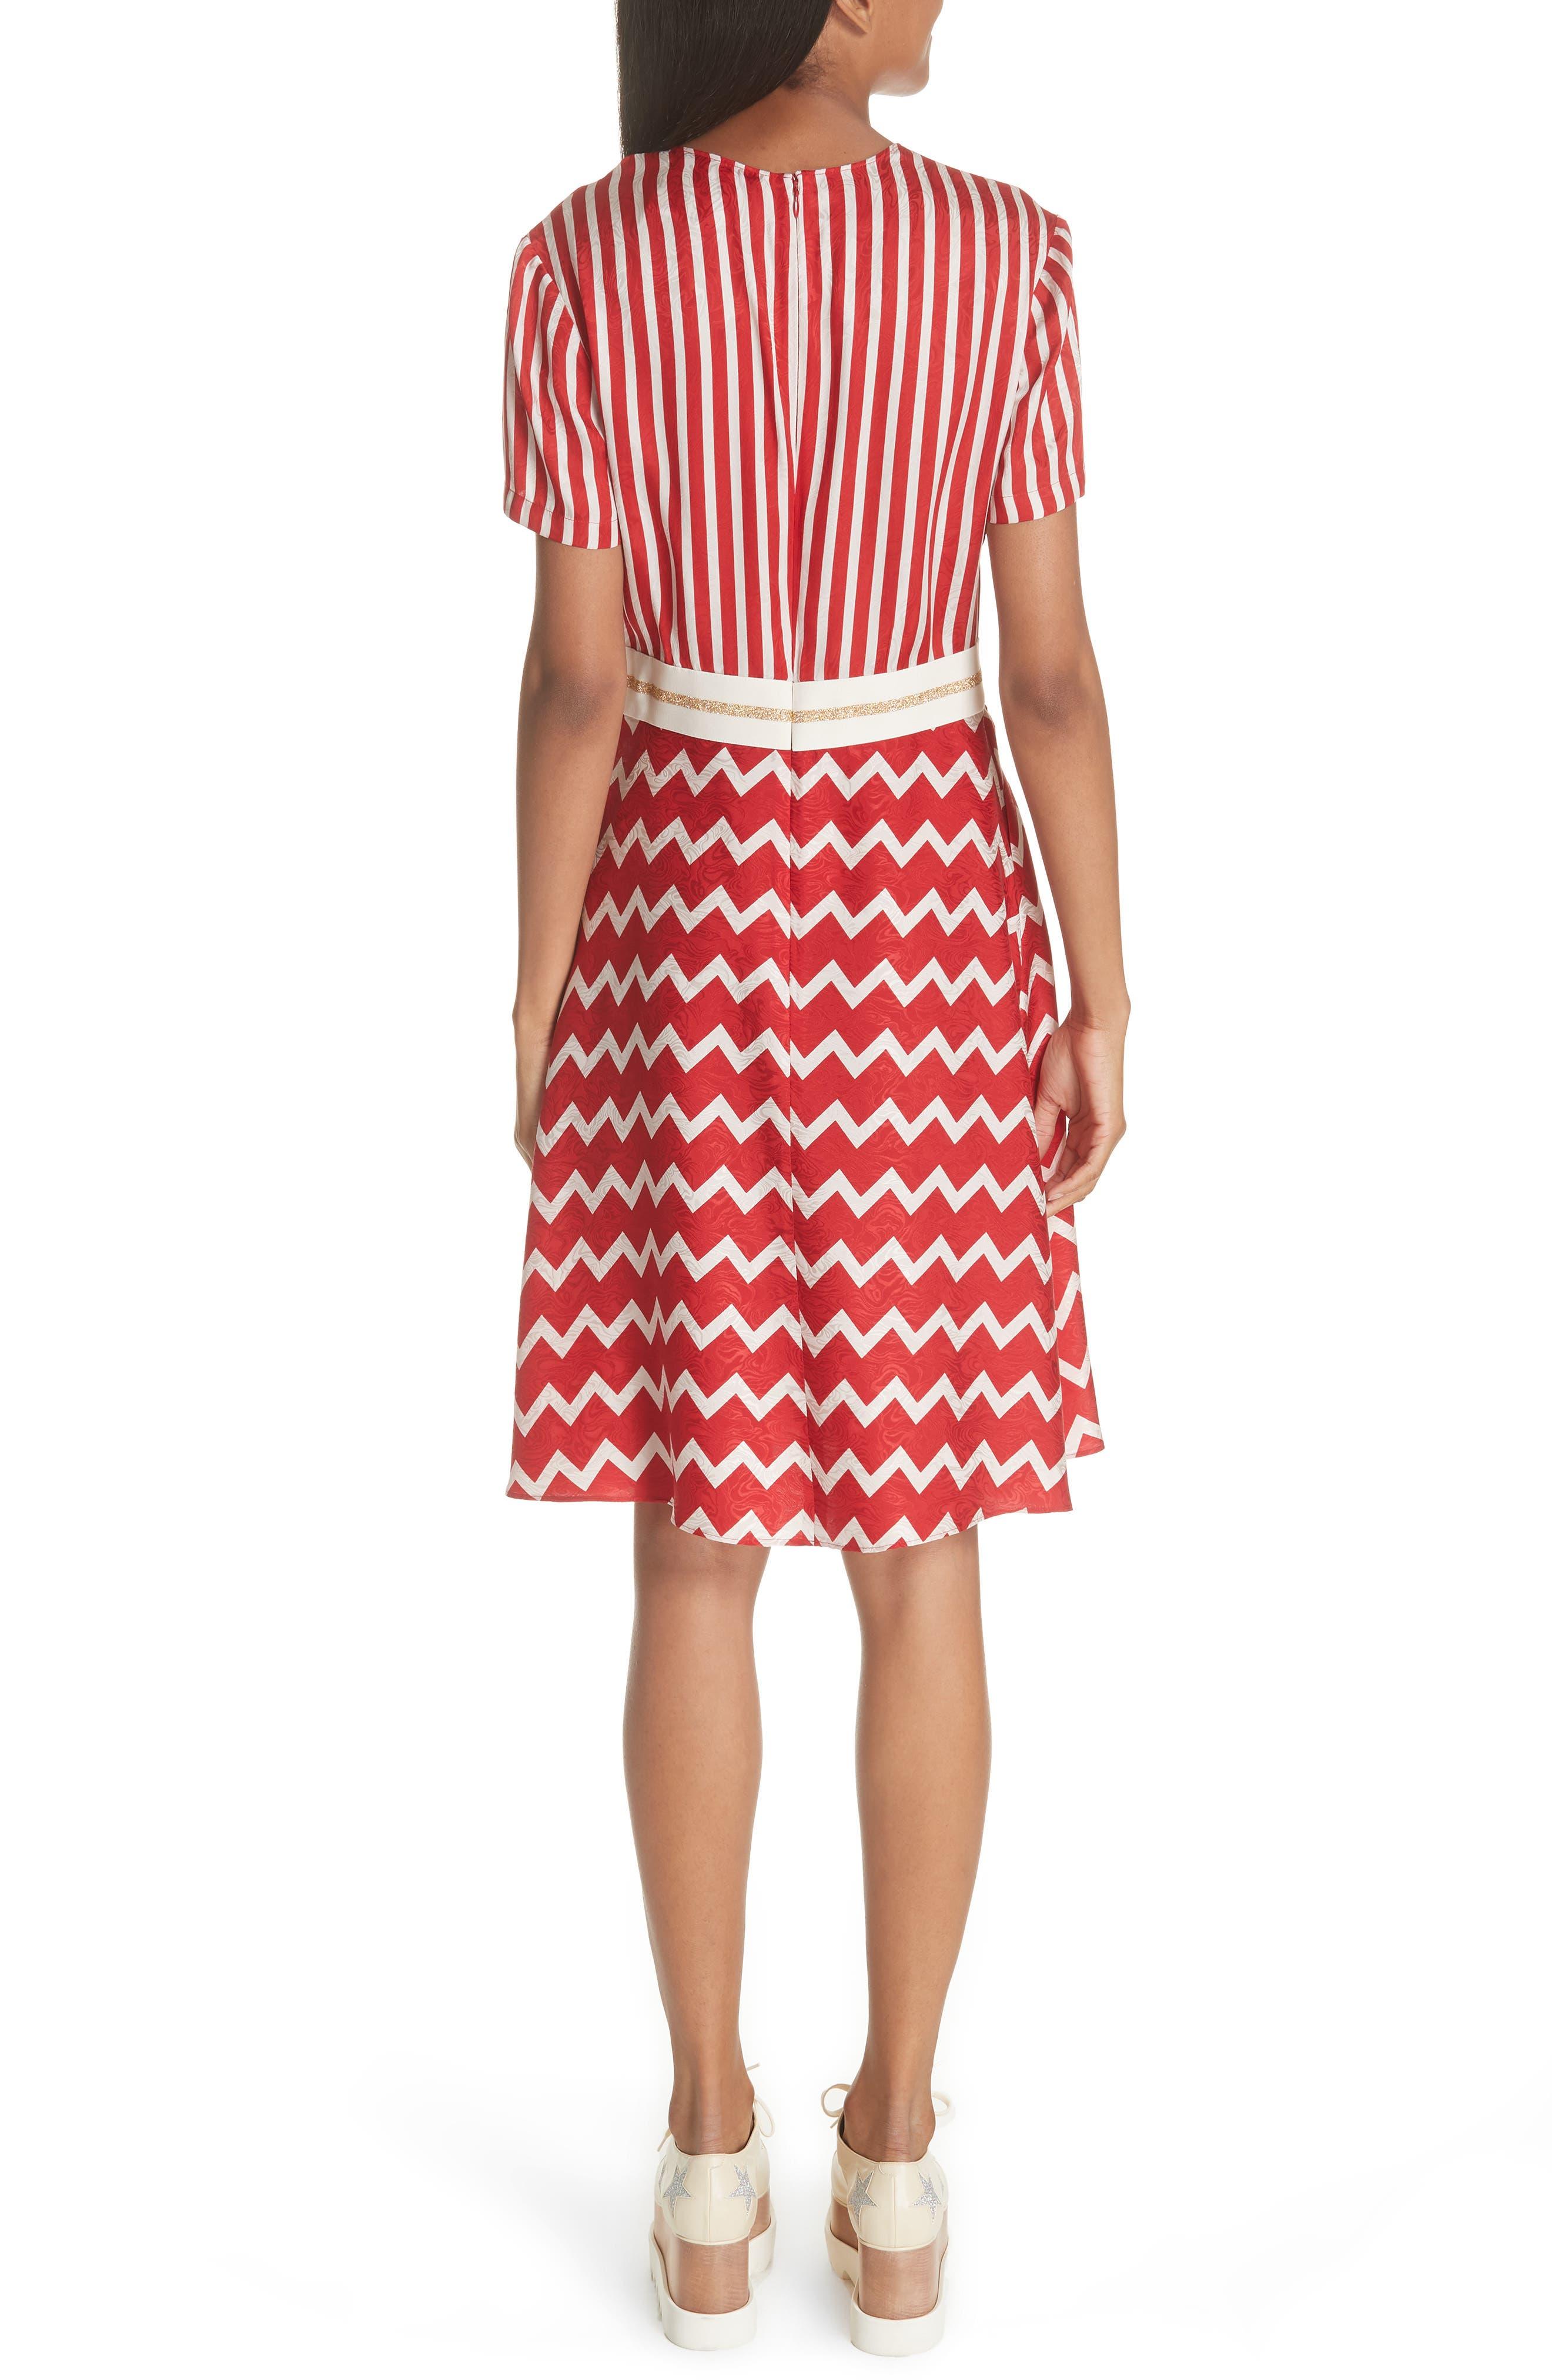 STELLA MCCARTNEY,                             Zigzag Stripe Silk Dress,                             Alternate thumbnail 2, color,                             627